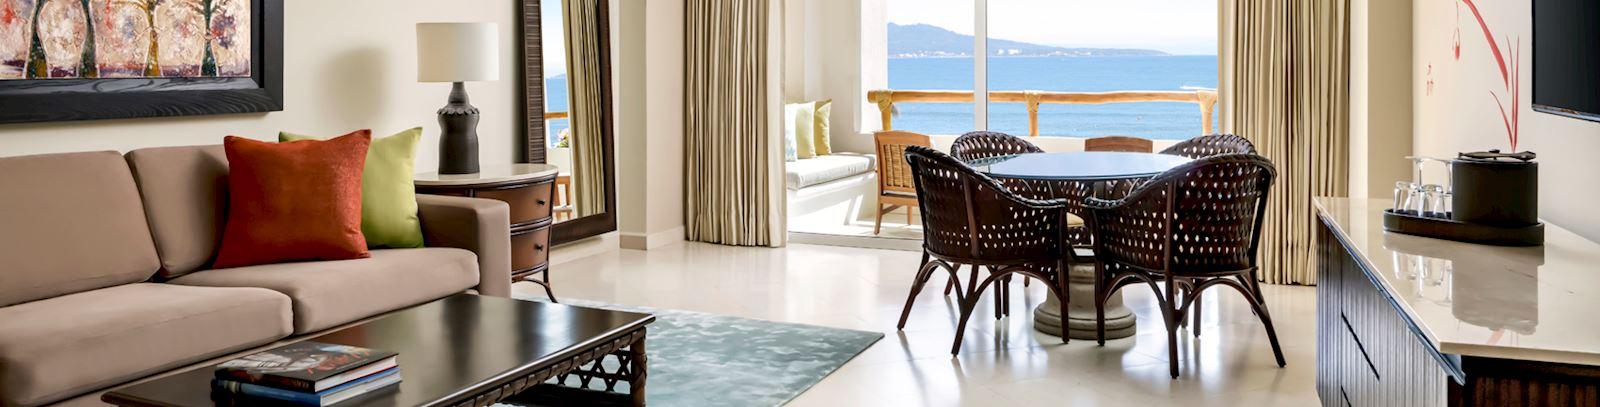 Master King Suite of Grand Velas Riviera Nayarit